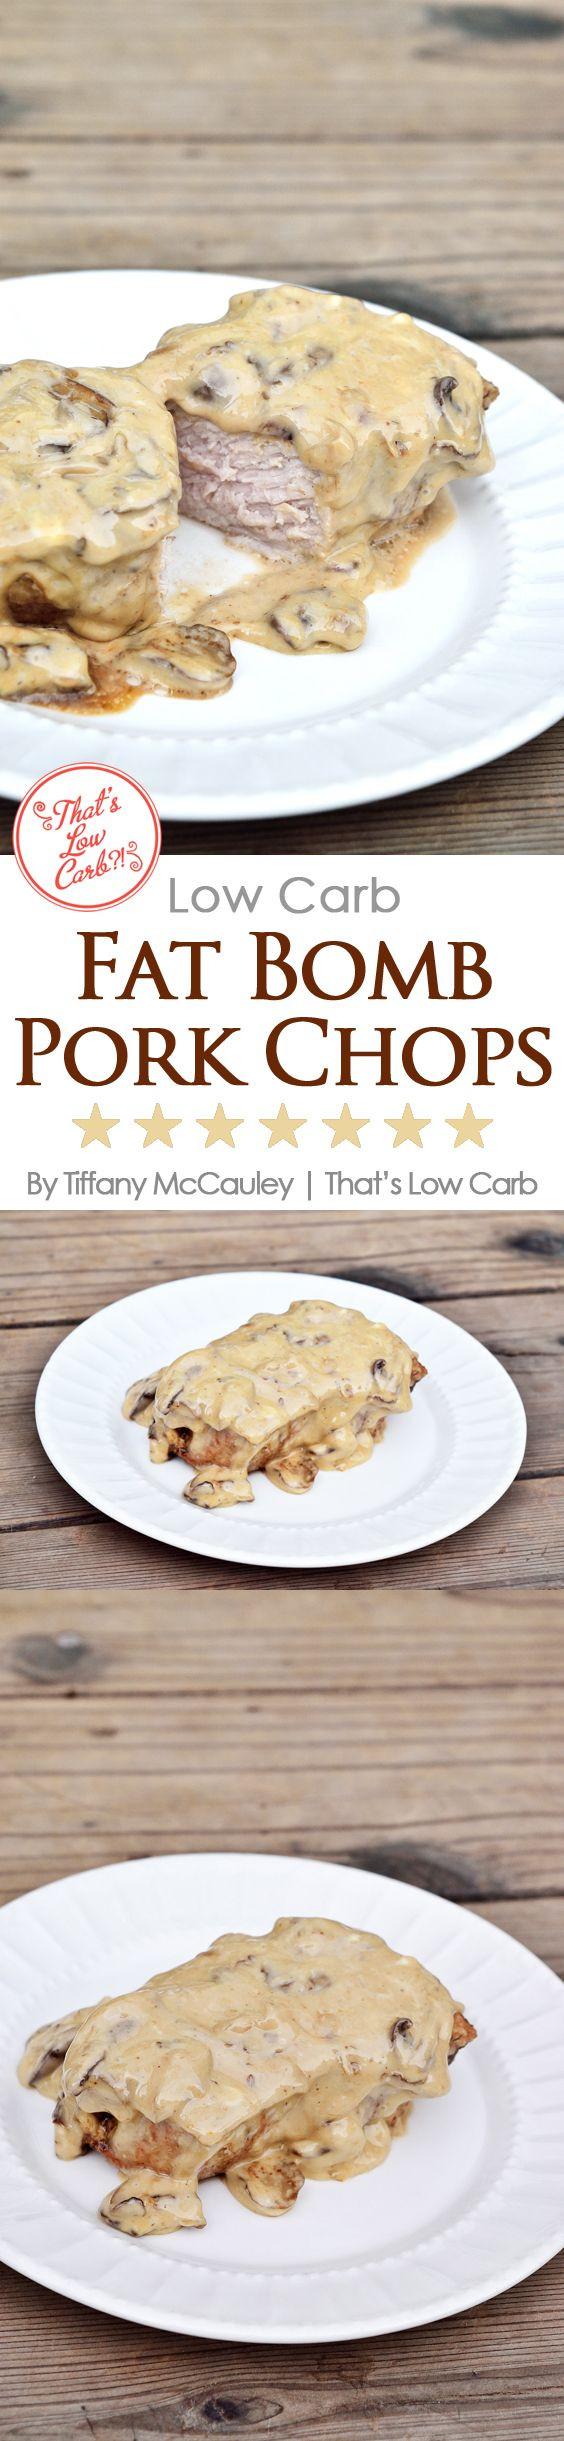 Low Calorie Pork Recipes  Low Carb Fat Bomb Pork Chops Recipe – KetosisDiet